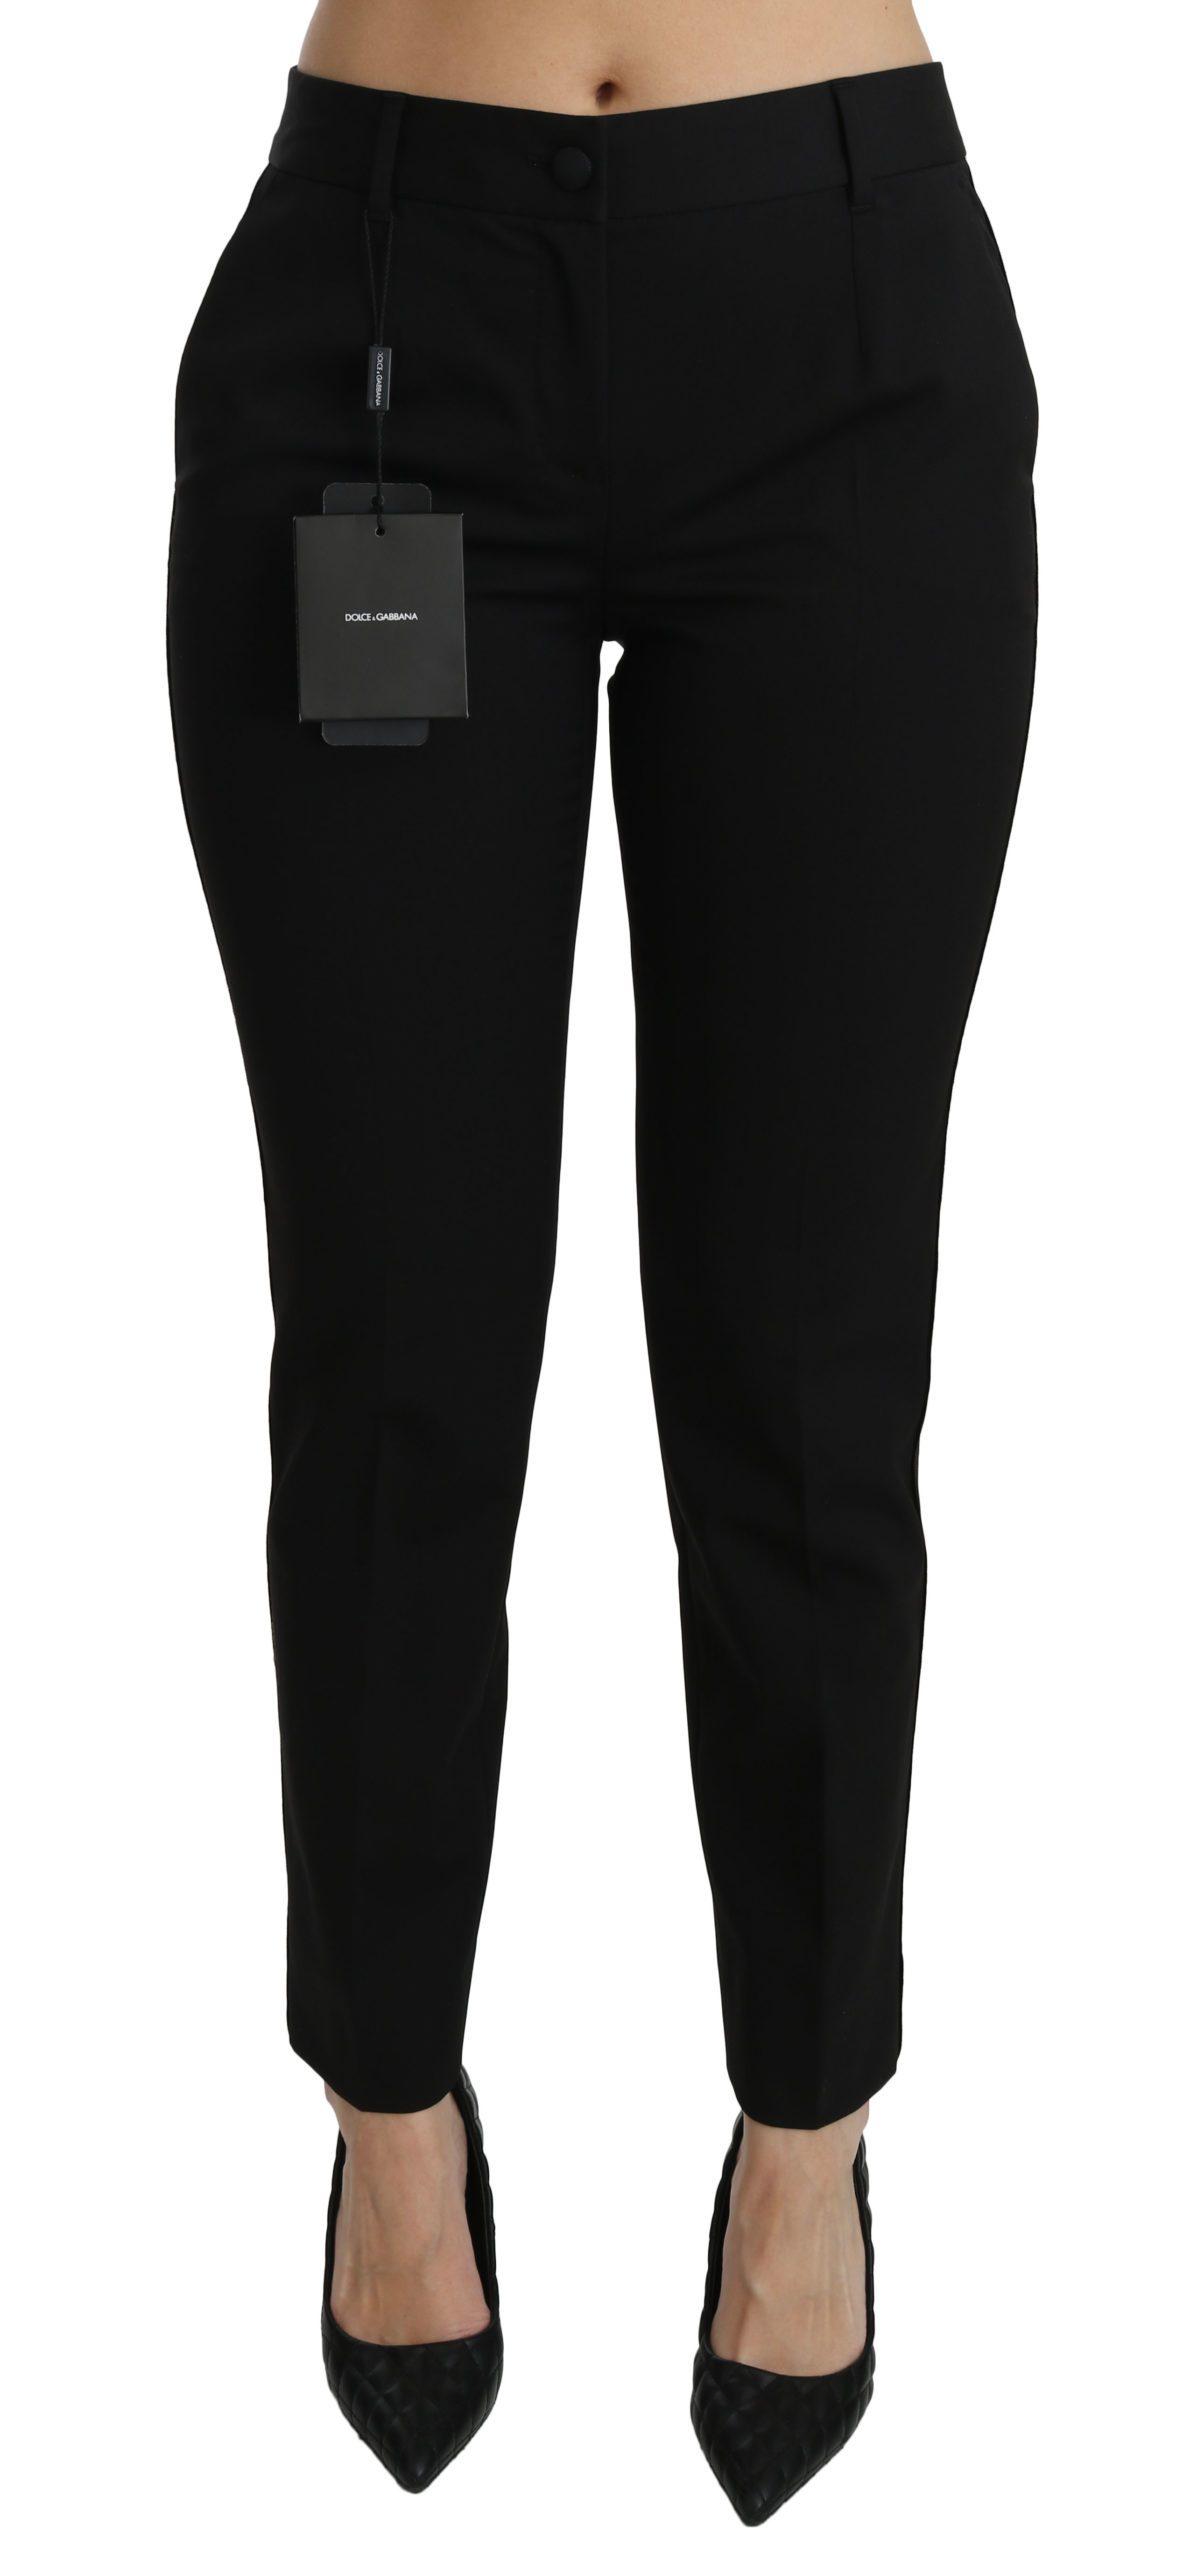 Dolce & Gabbana Women's Mid Waist Skinny Formal Trouser Black PAN70860 - IT40|S